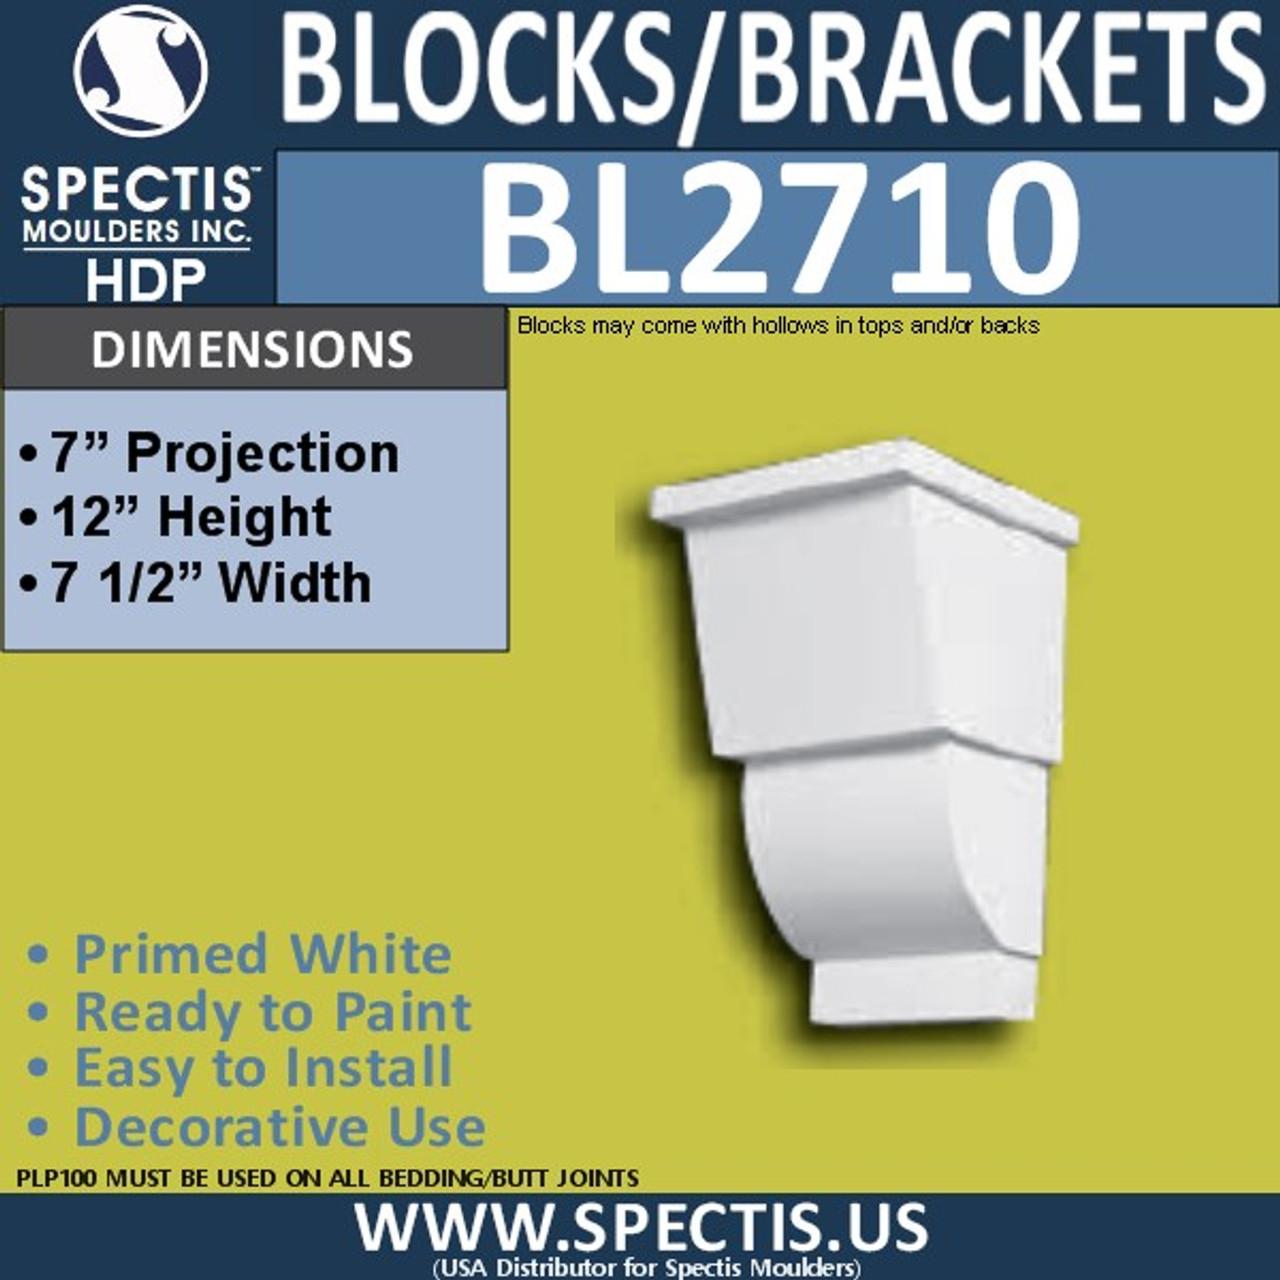 "BL2710 Eave Block or Bracket 7.5""W x 12""H x 7"" P"